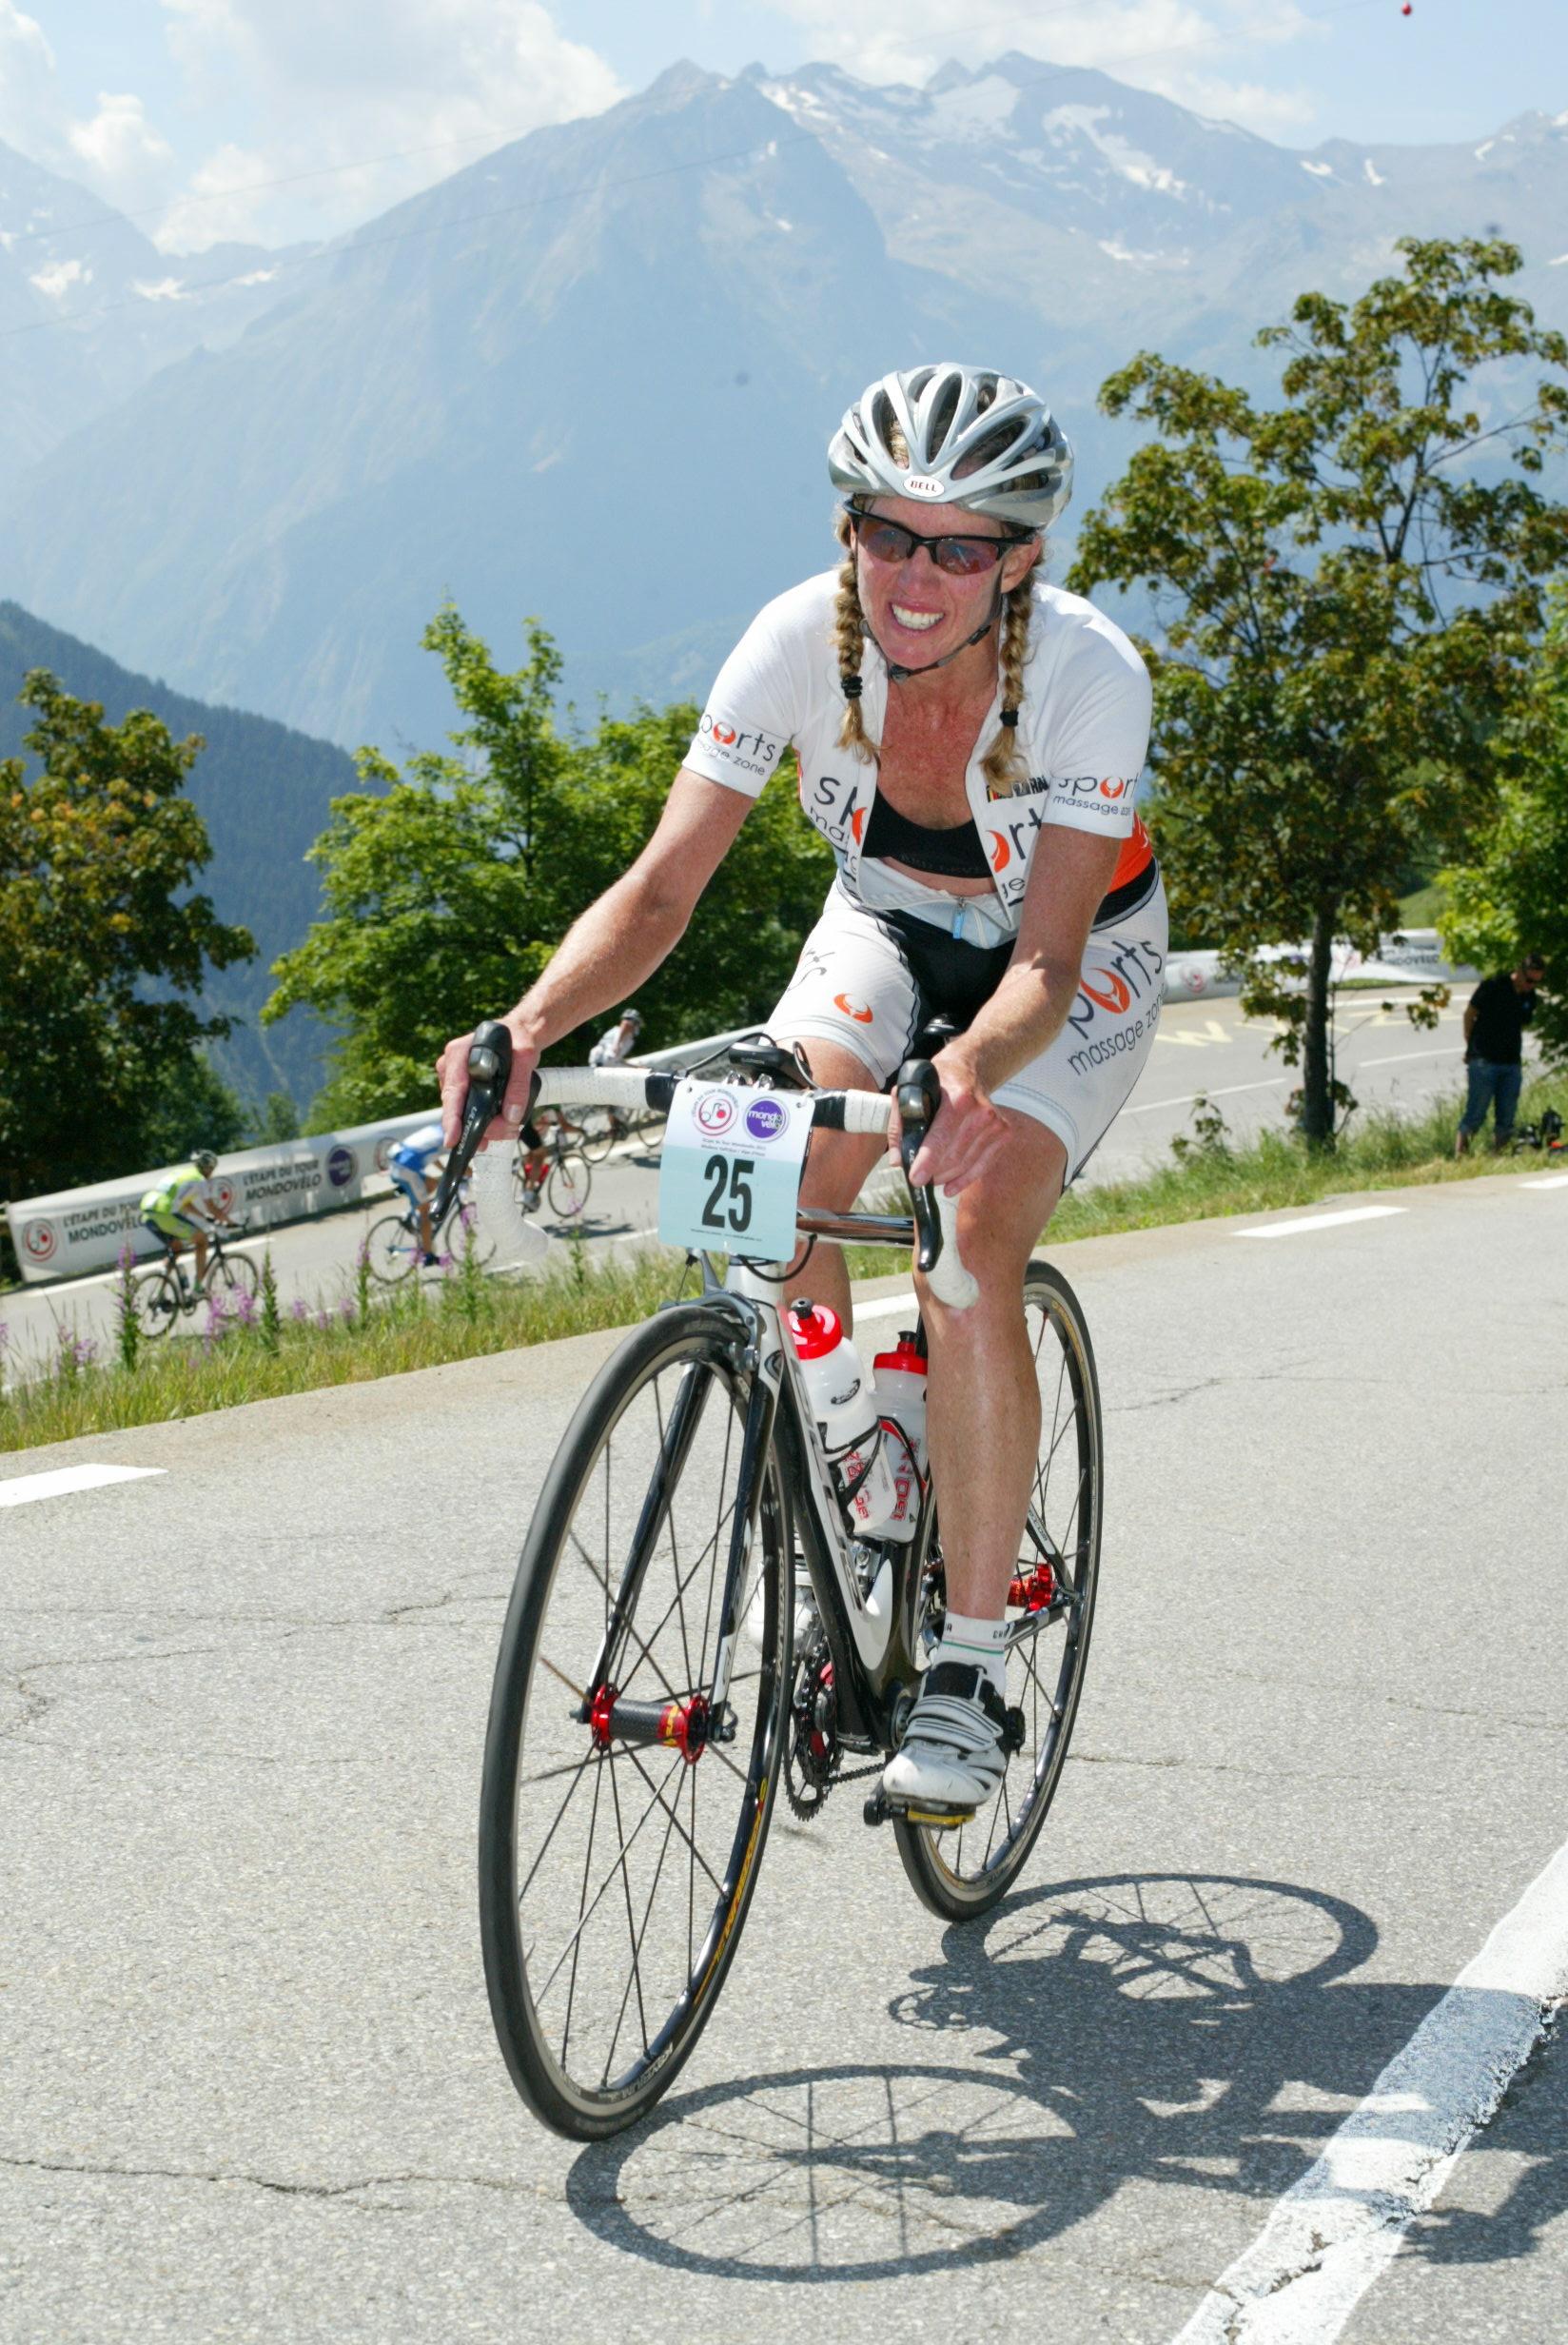 Riding Up Alpe Dhuez